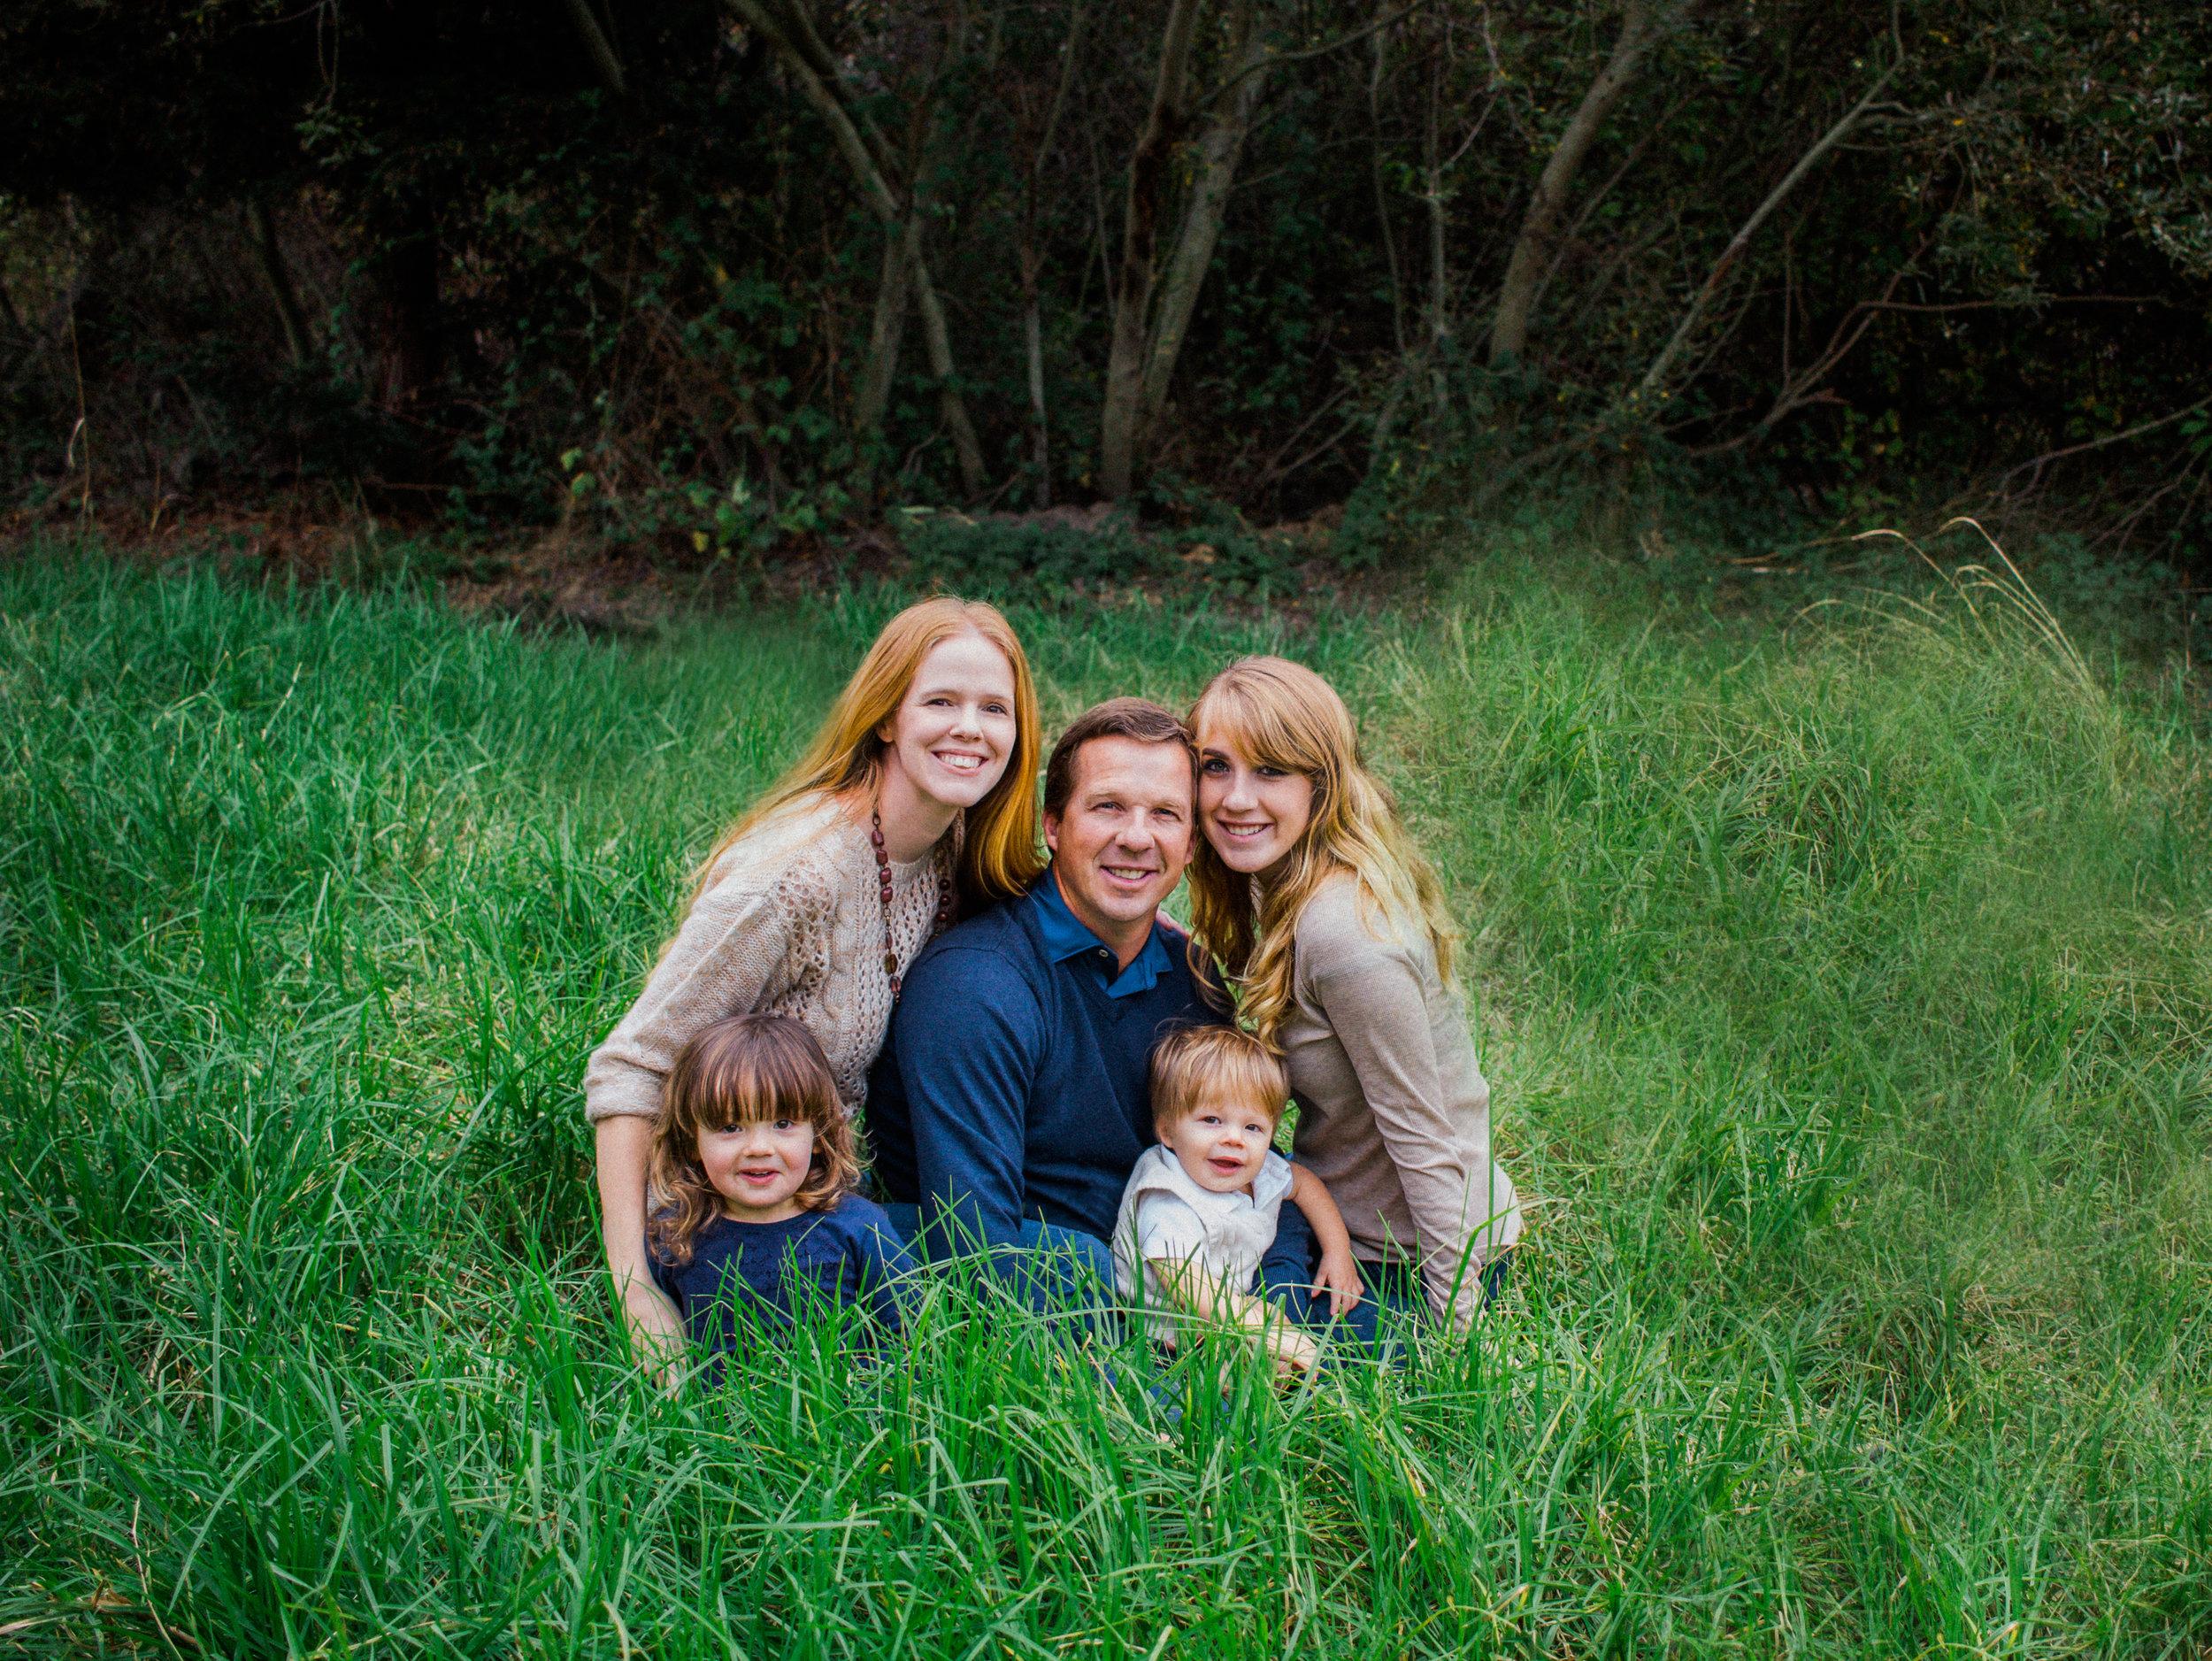 Our last family photo taken 2 years ago!